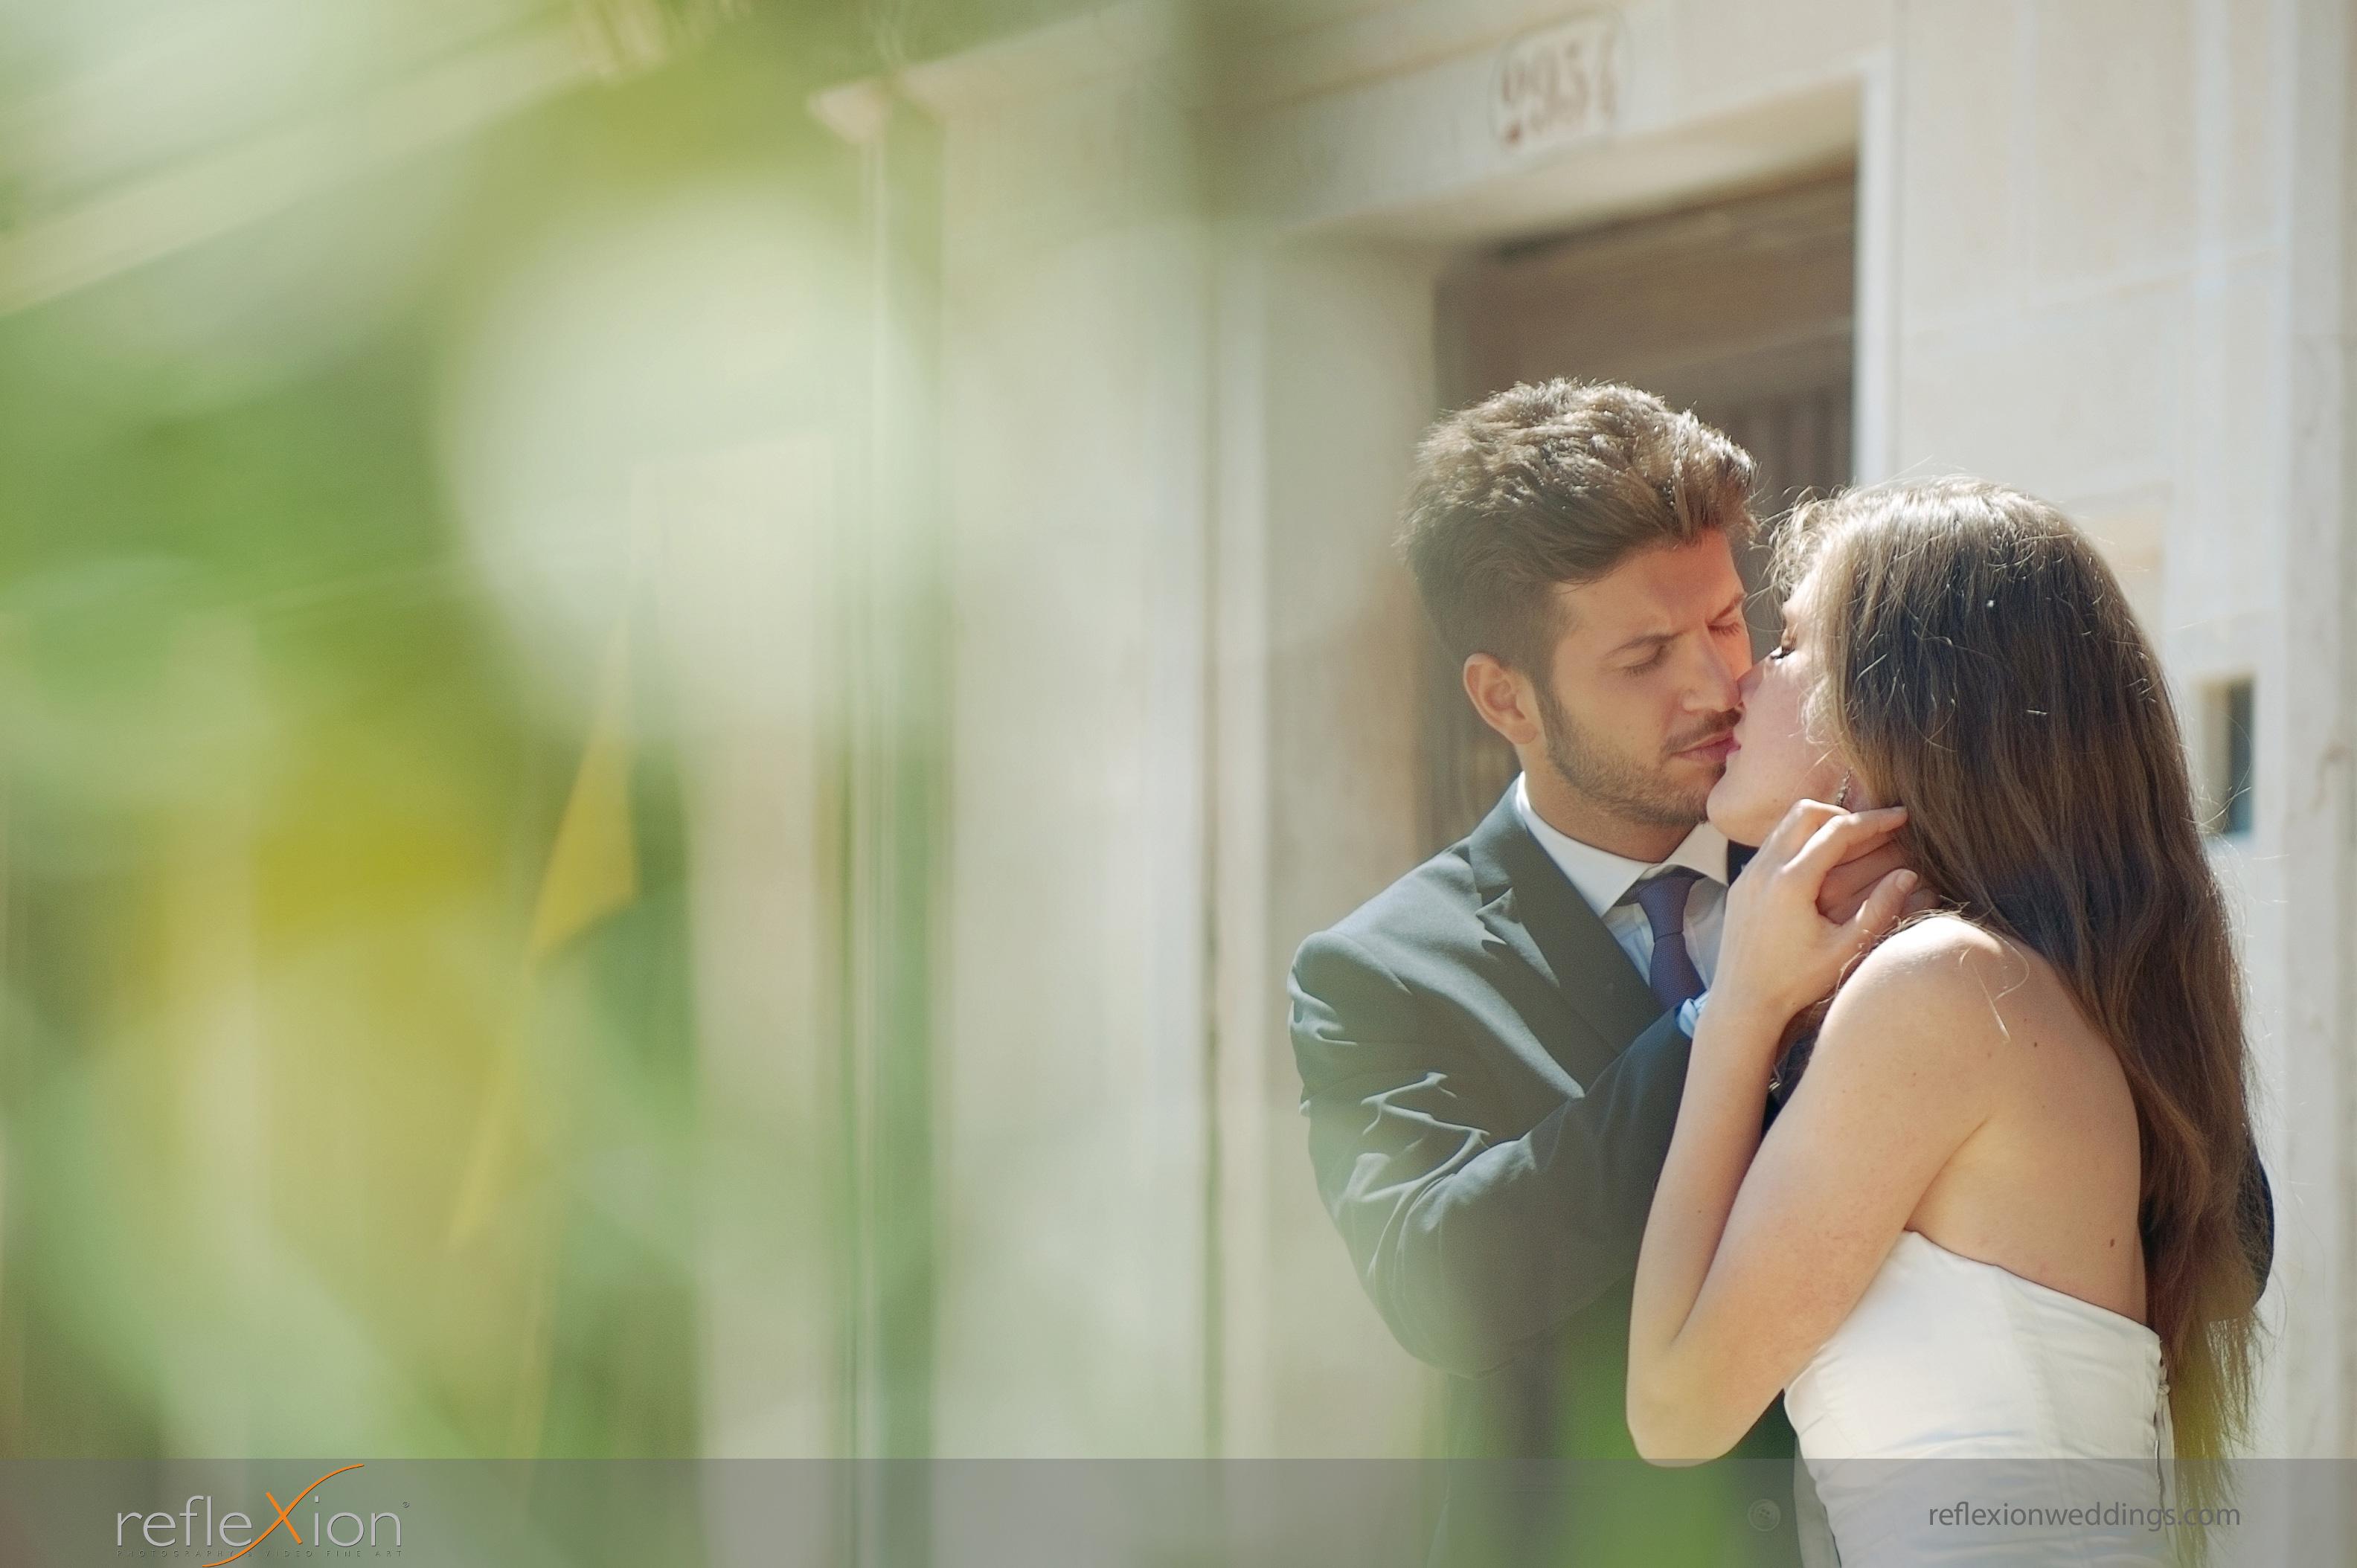 Locations for wedding photography in Venice - pontoone bridge 2